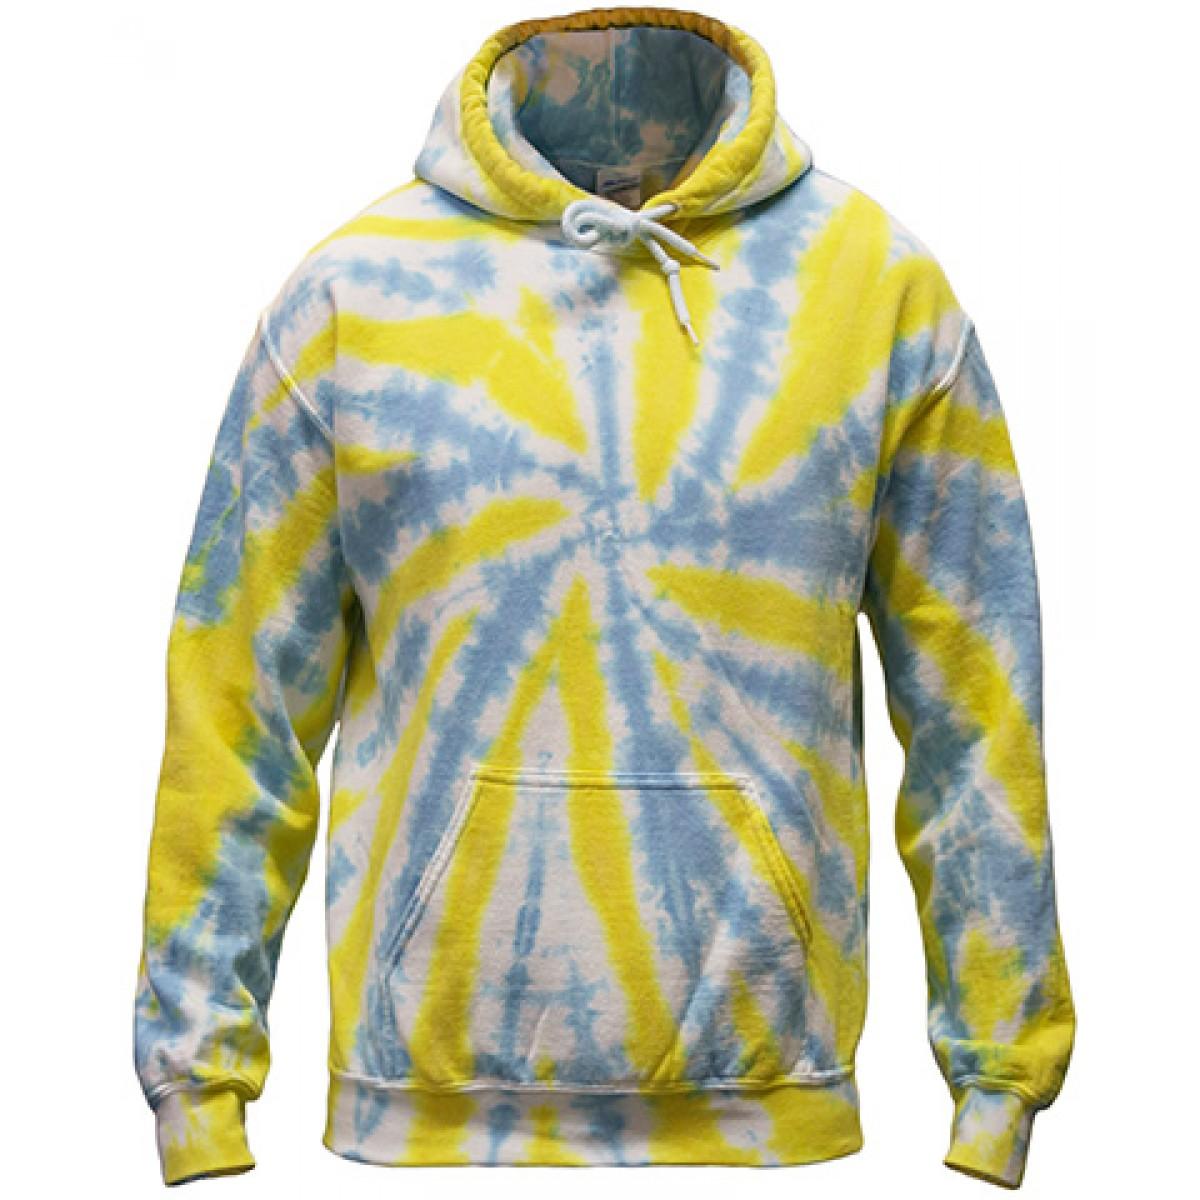 Tie-Dye Pullover Hooded Sweatshirt-Blue/Yellow-YL